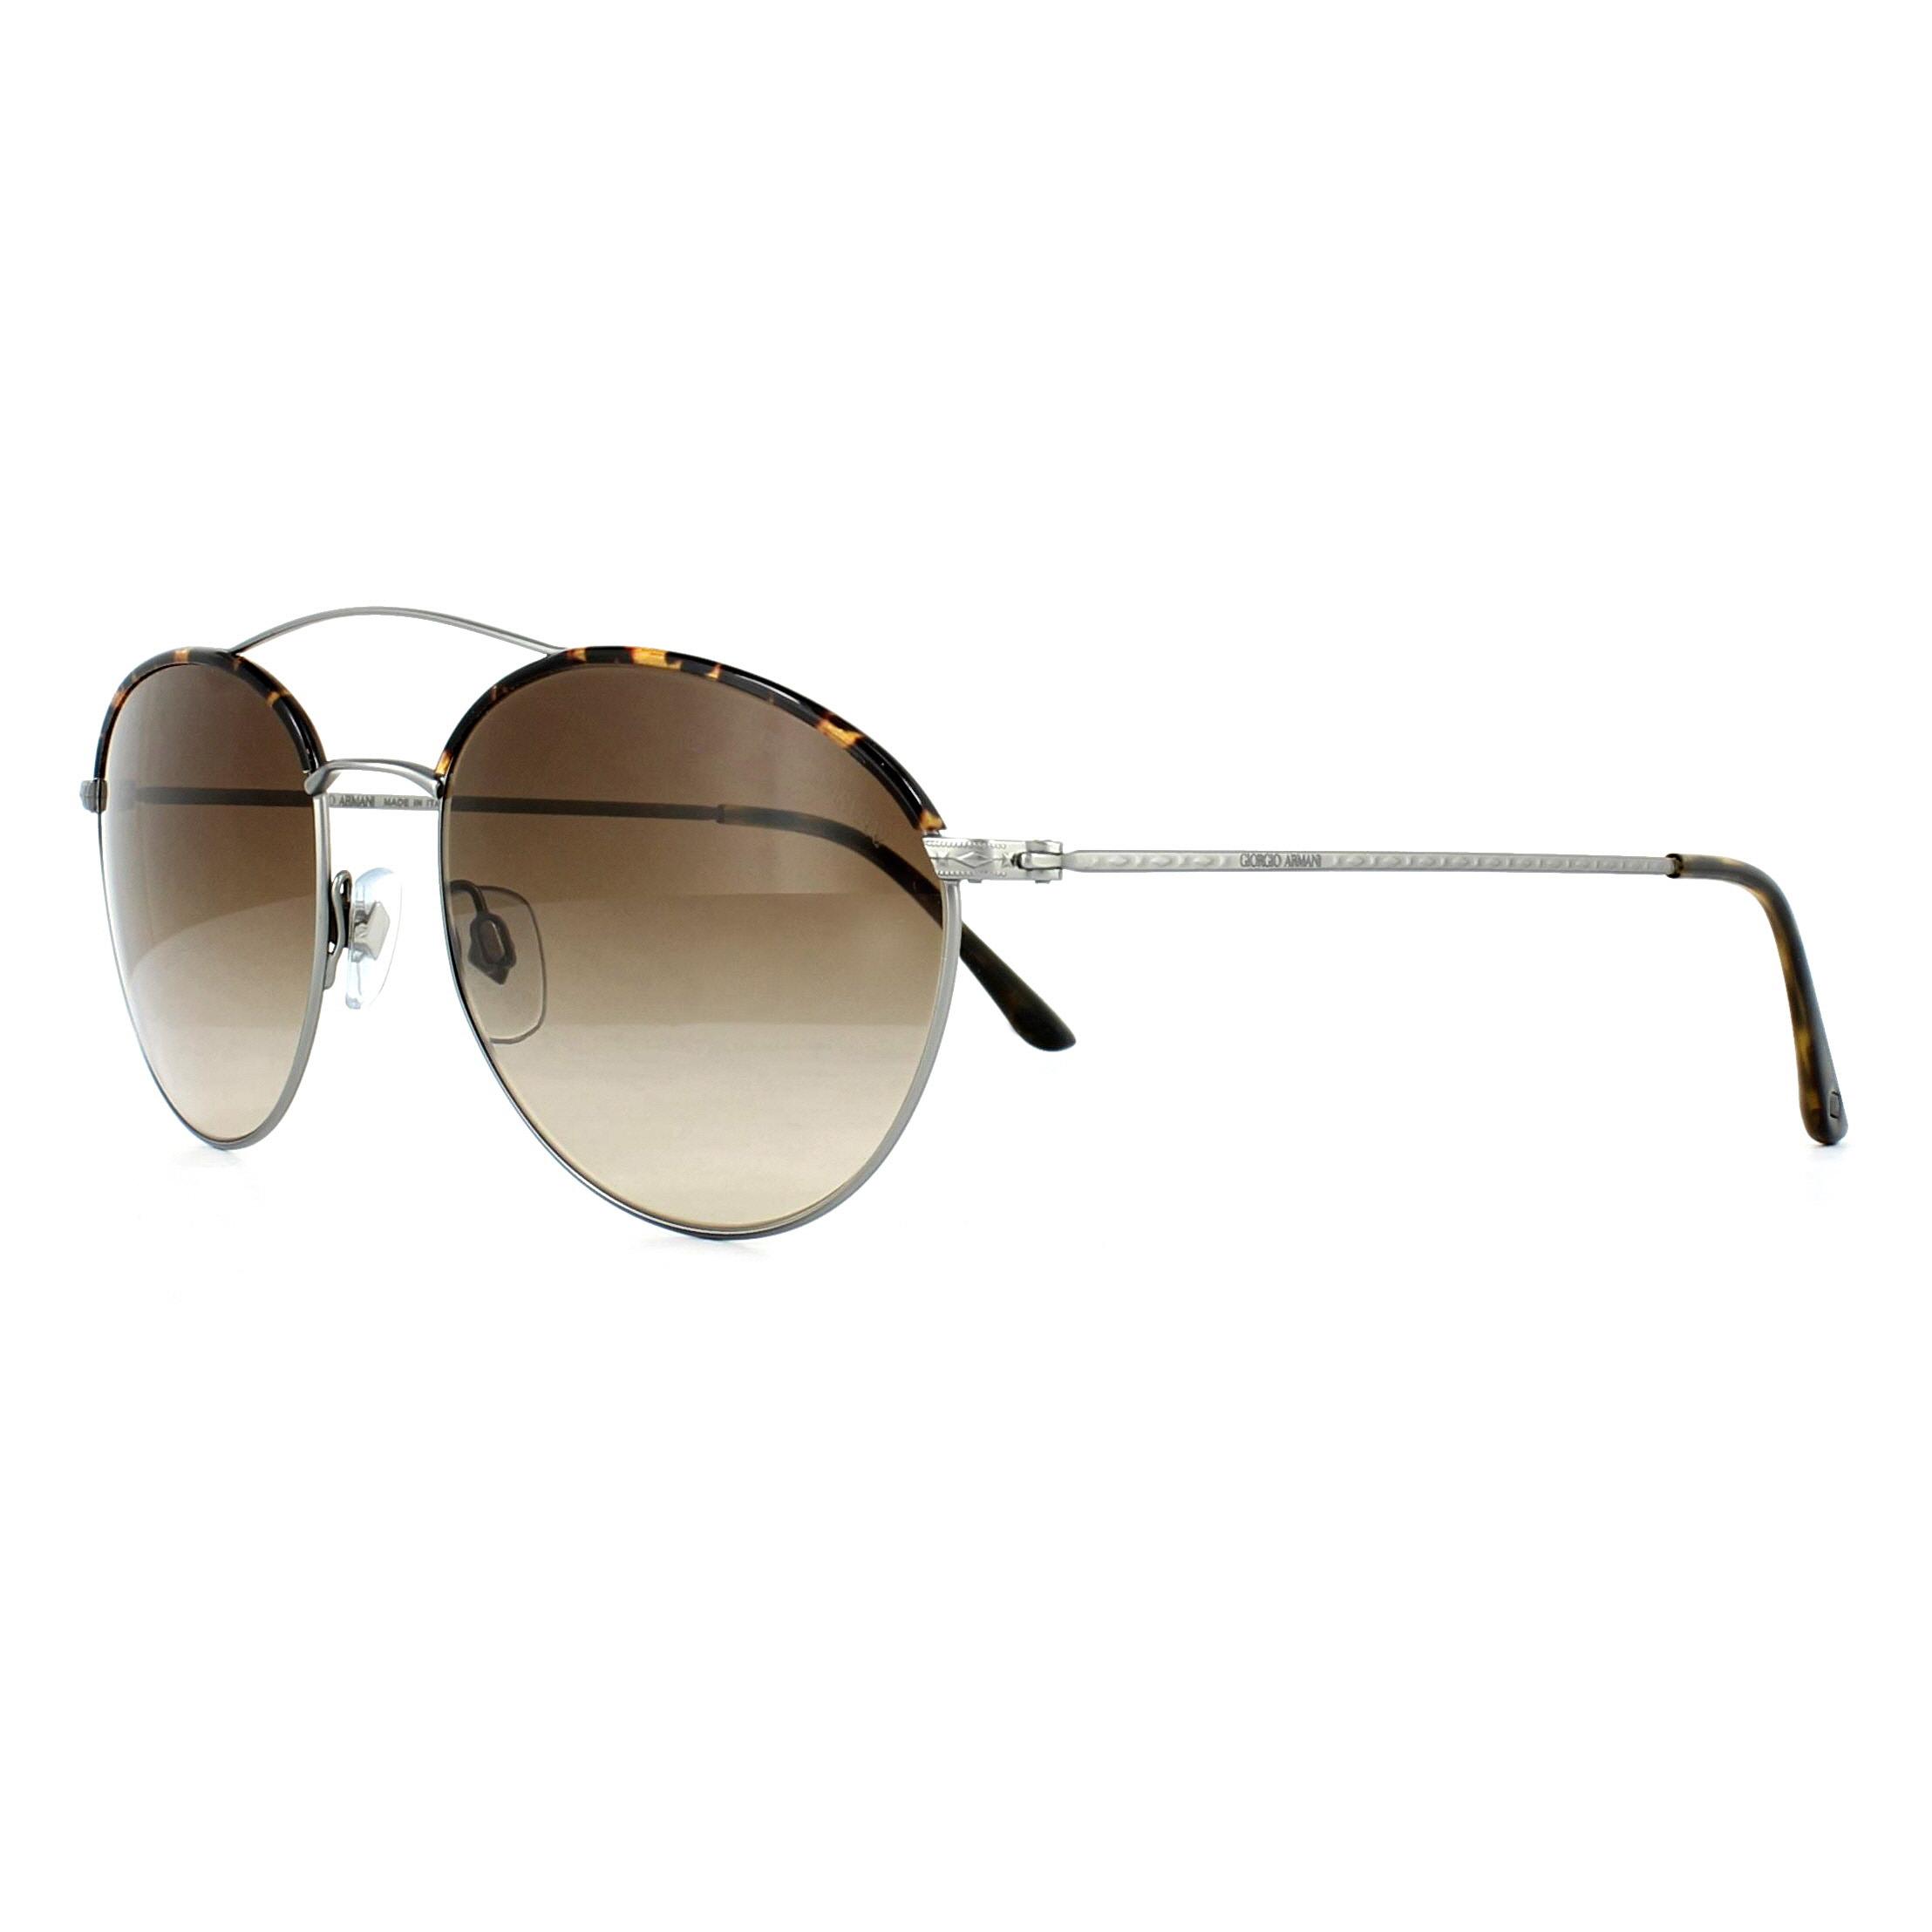 327a3a7b341f4 Sentinel Giorgio Armani Sunglasses AR6032J 300313 Matte Gunmetal Brown  Gradient